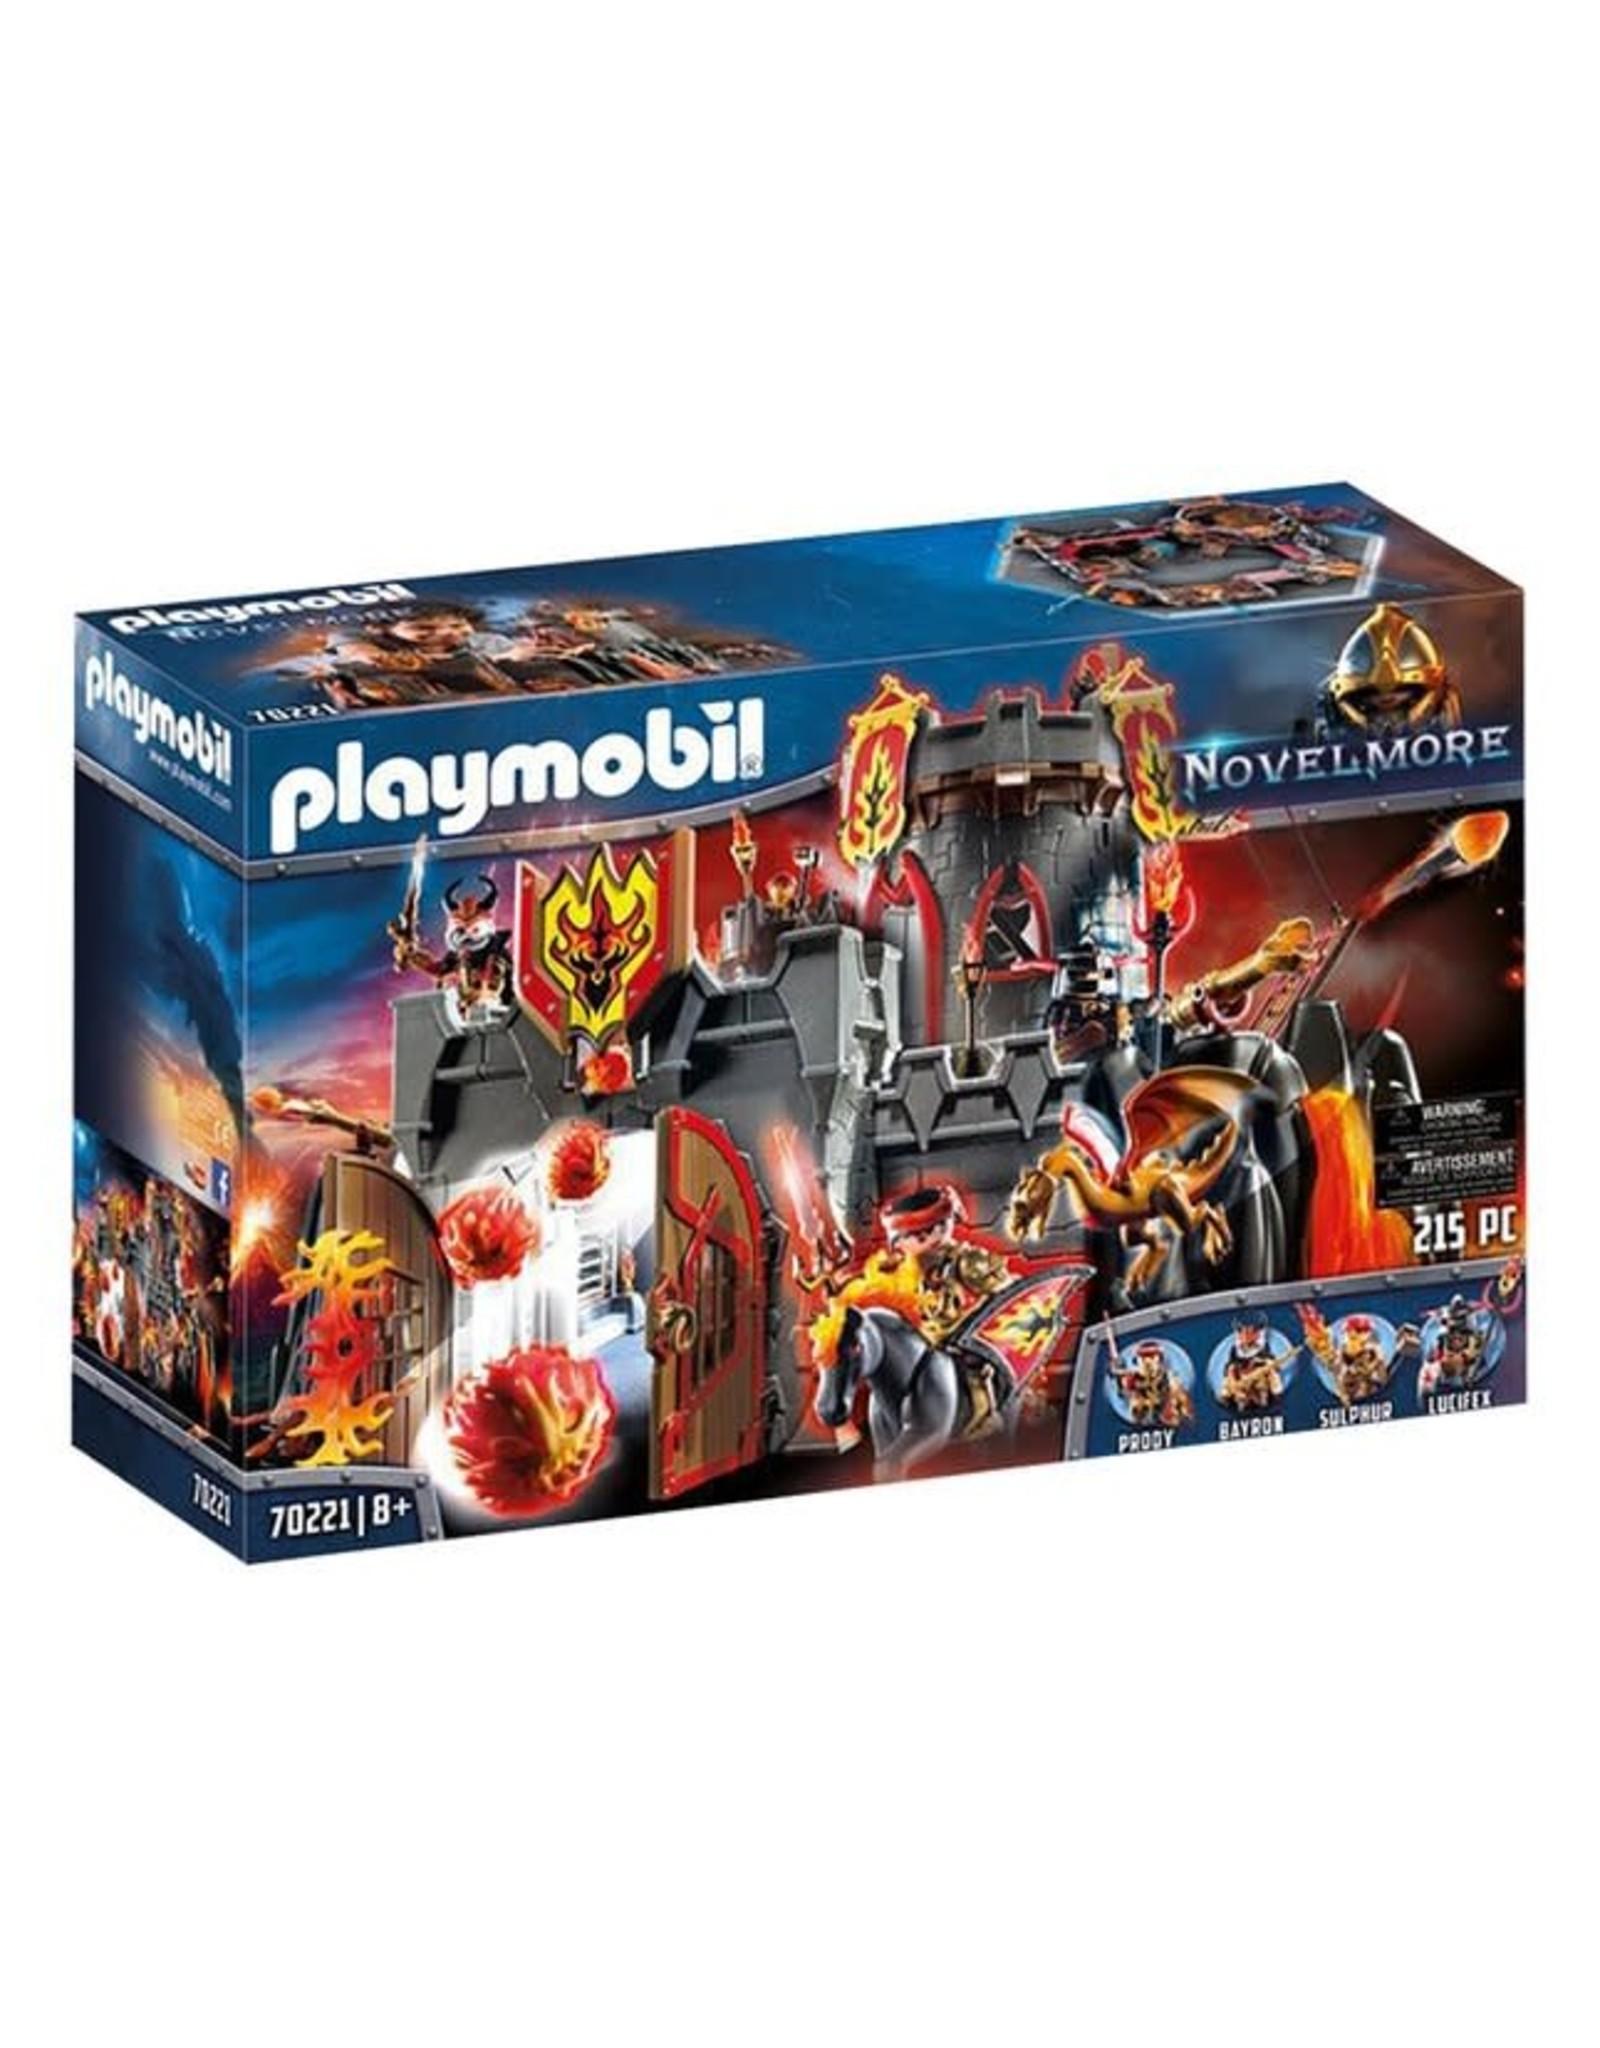 PLAYMOBIL Playmobil - Burnham Raiders Fortress (70221)